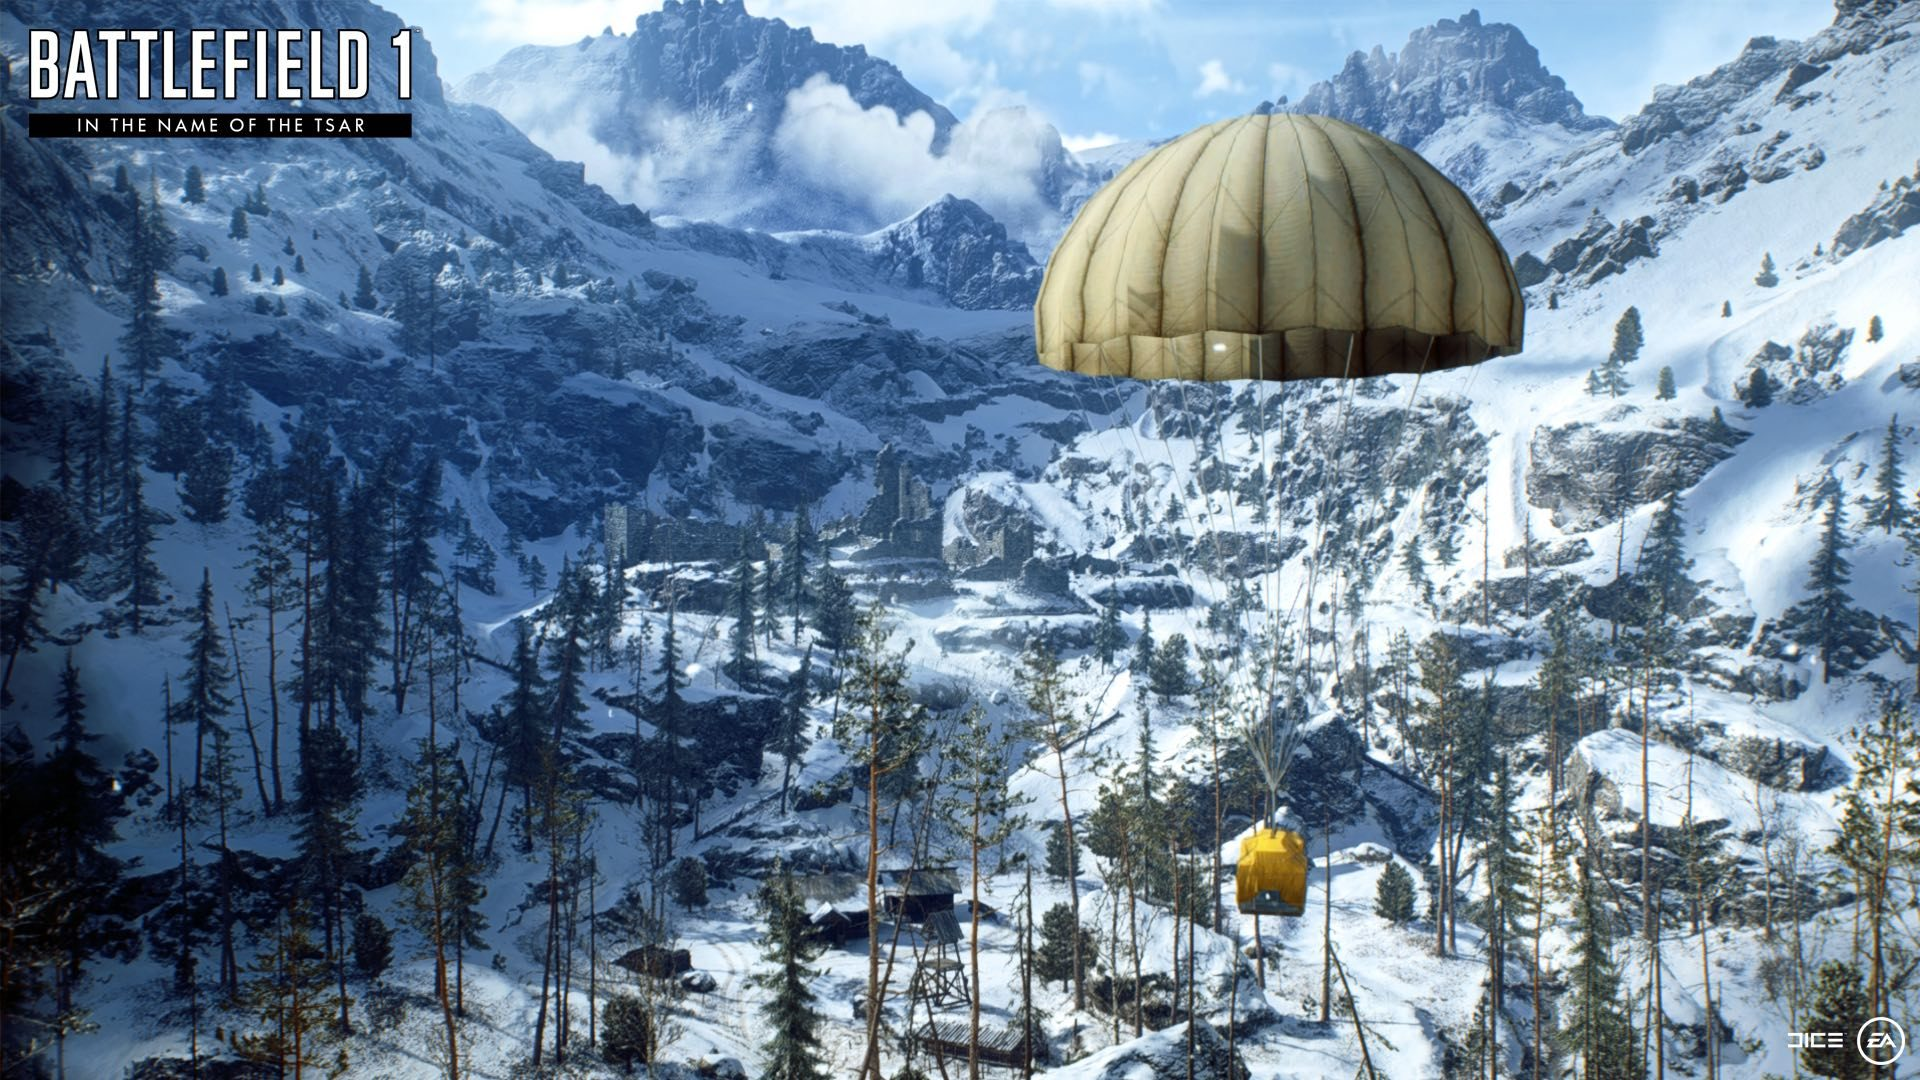 Battlefield 1 screenshot in the name of the tsar